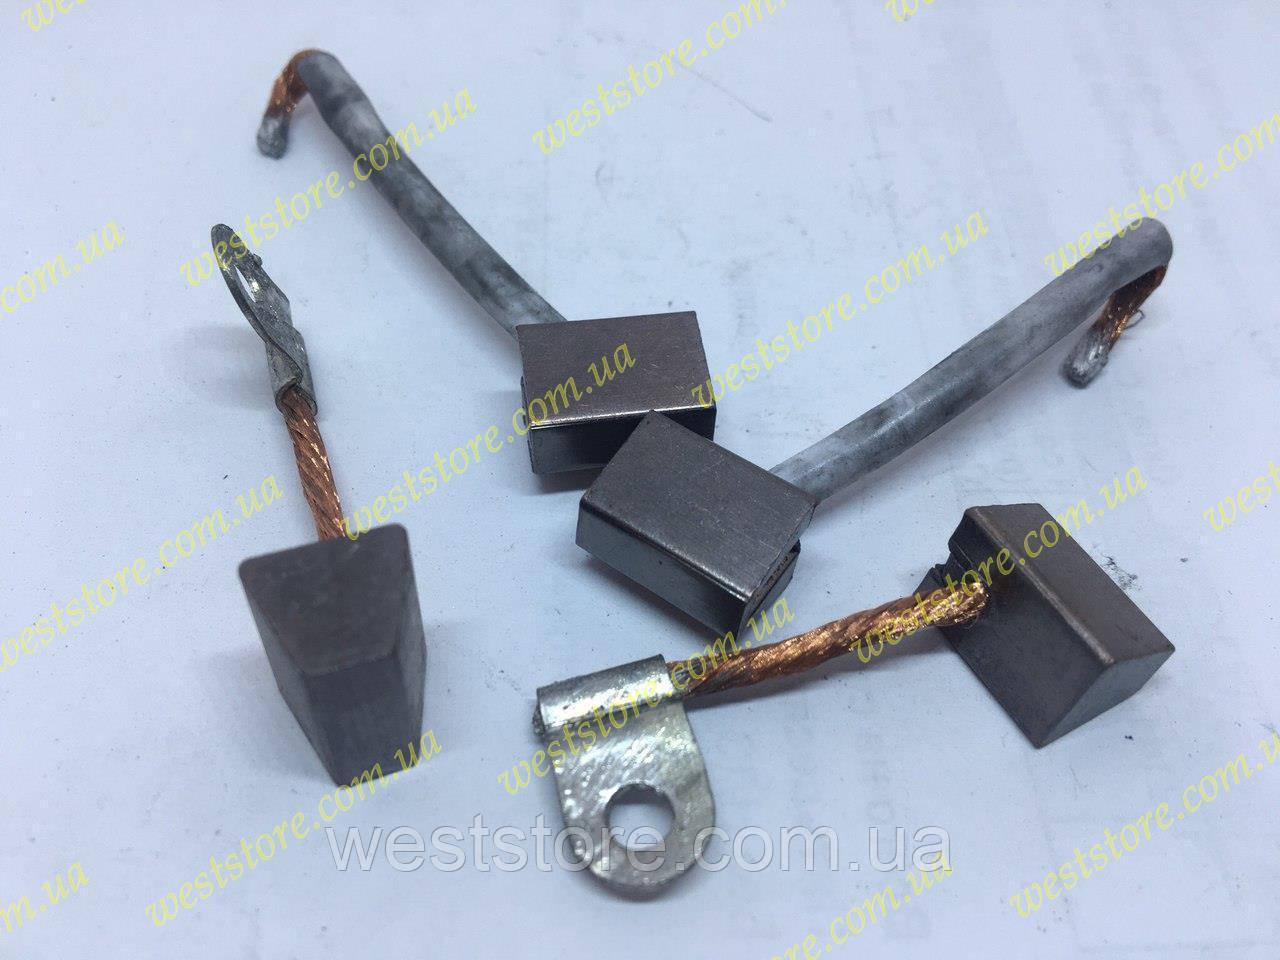 Ремкомплект стартера (щетки) Заз 1102 1103 таврия славута, ваз 2101- 2107 (на херсонский стартер) Кинешма